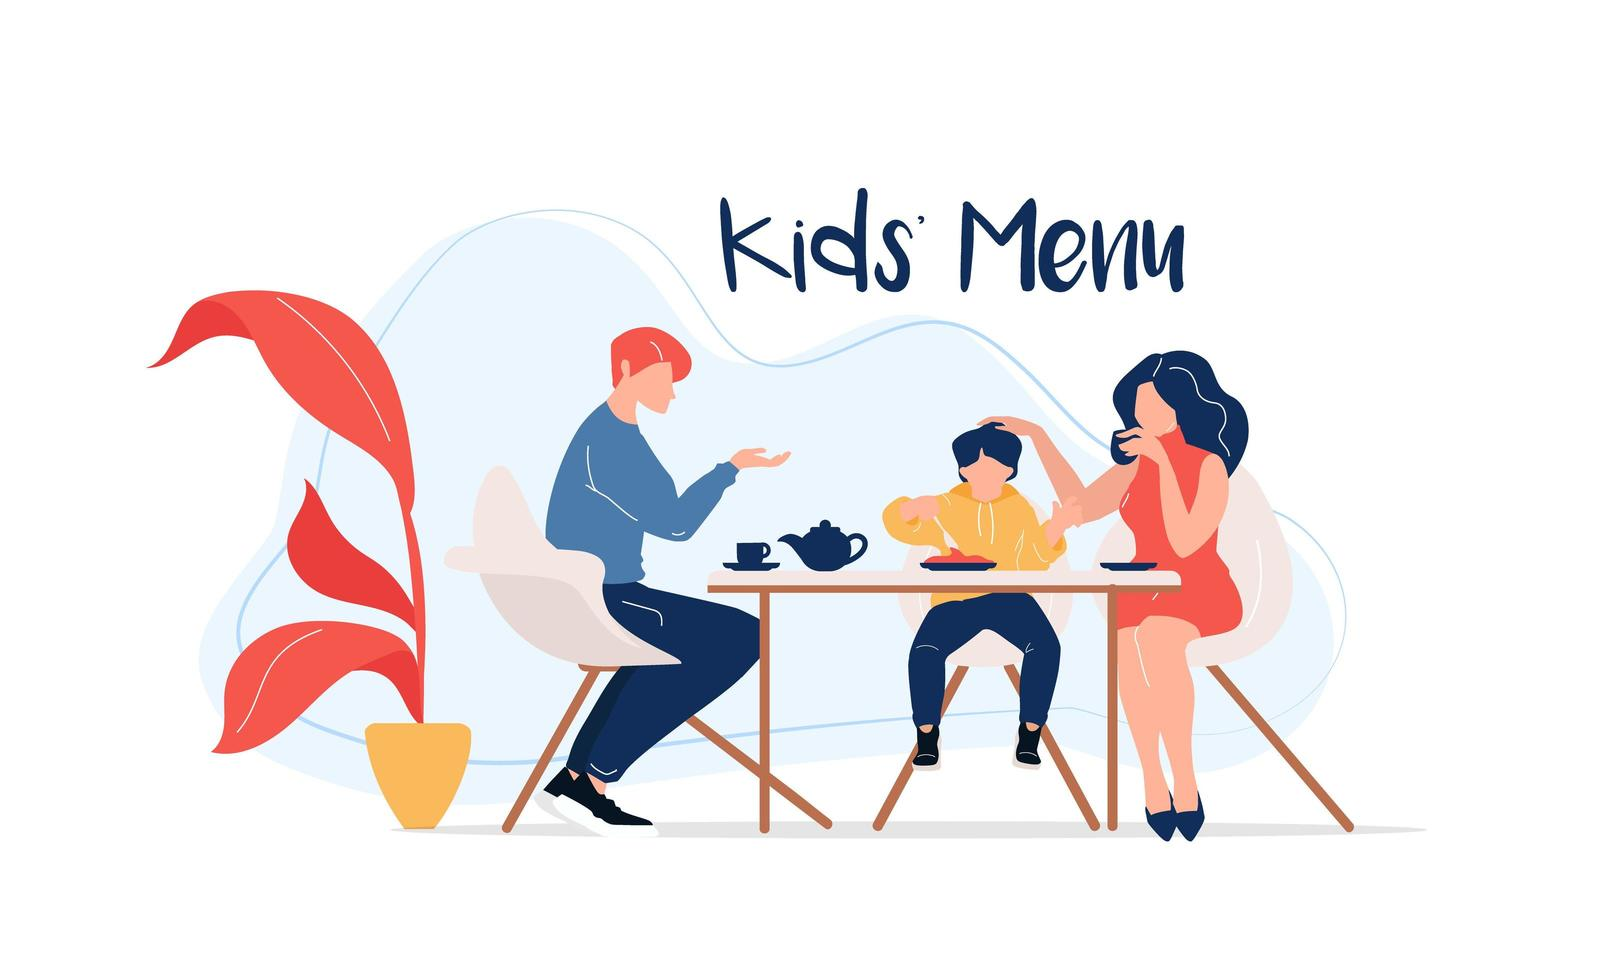 kindermenu aan tafel vector